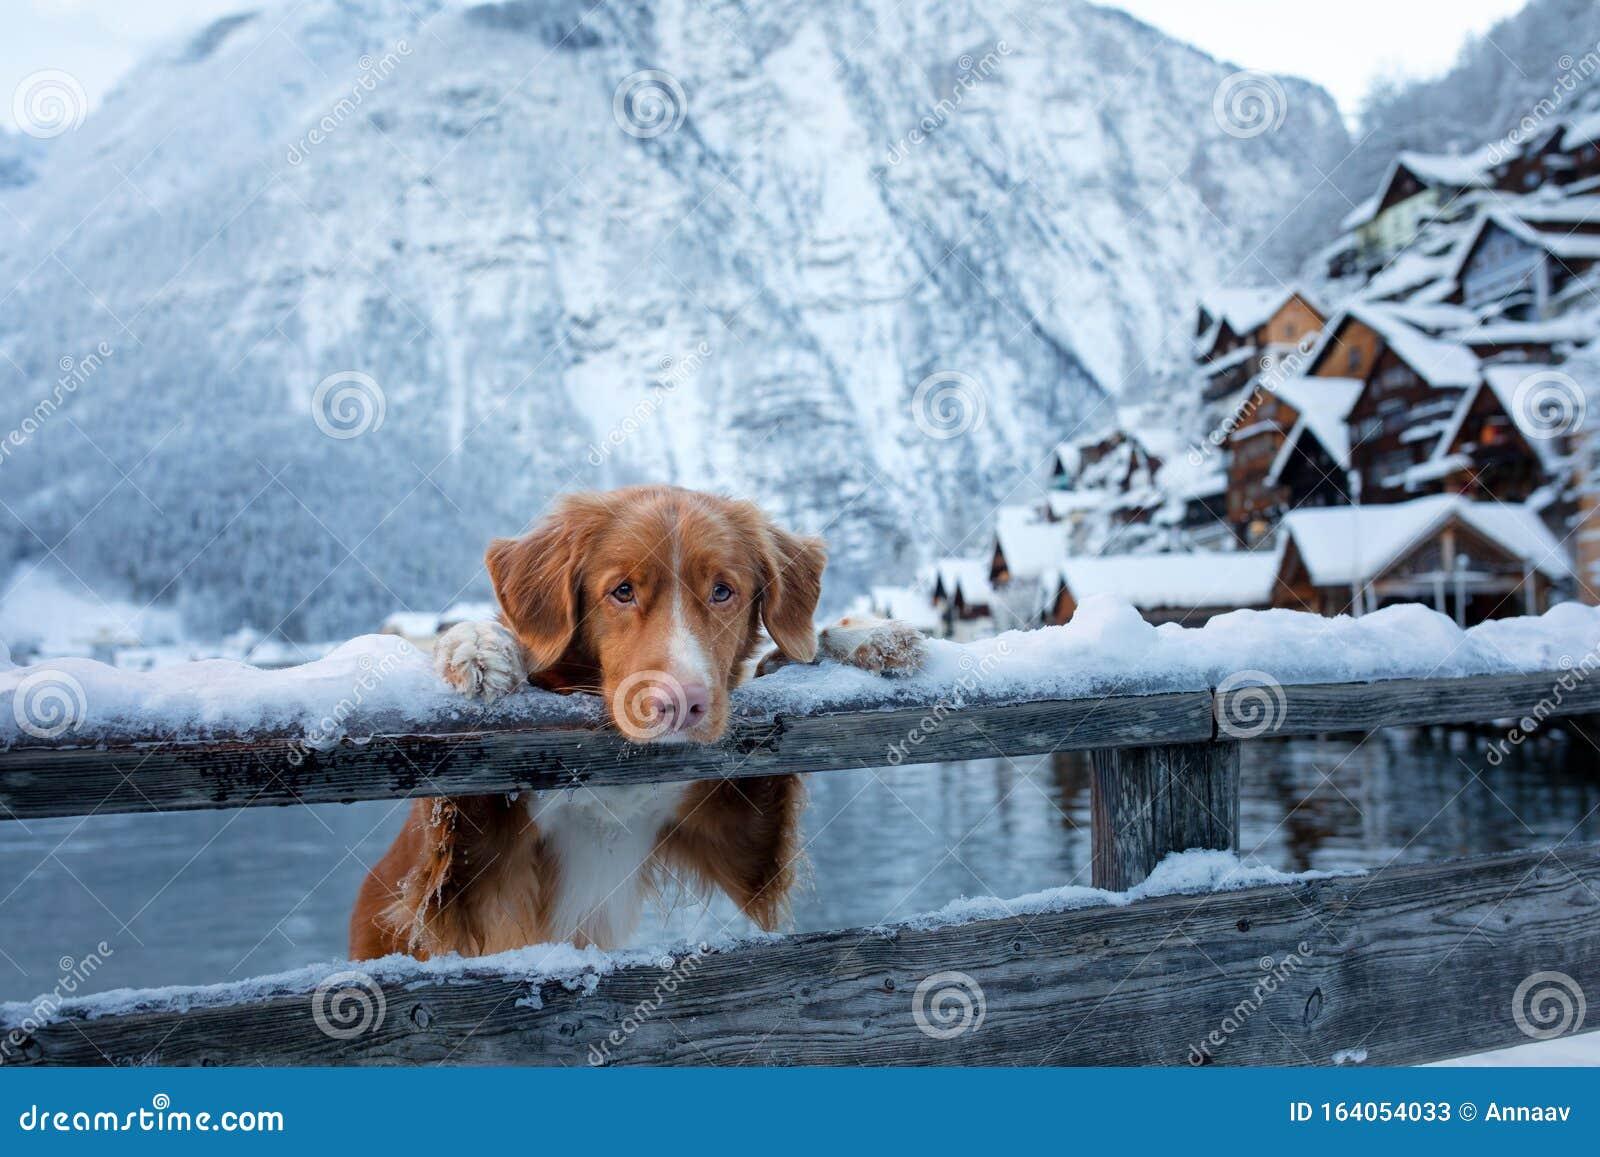 Dog In Nature In Winter Nova Scotia Duck Tolling Retriever In The